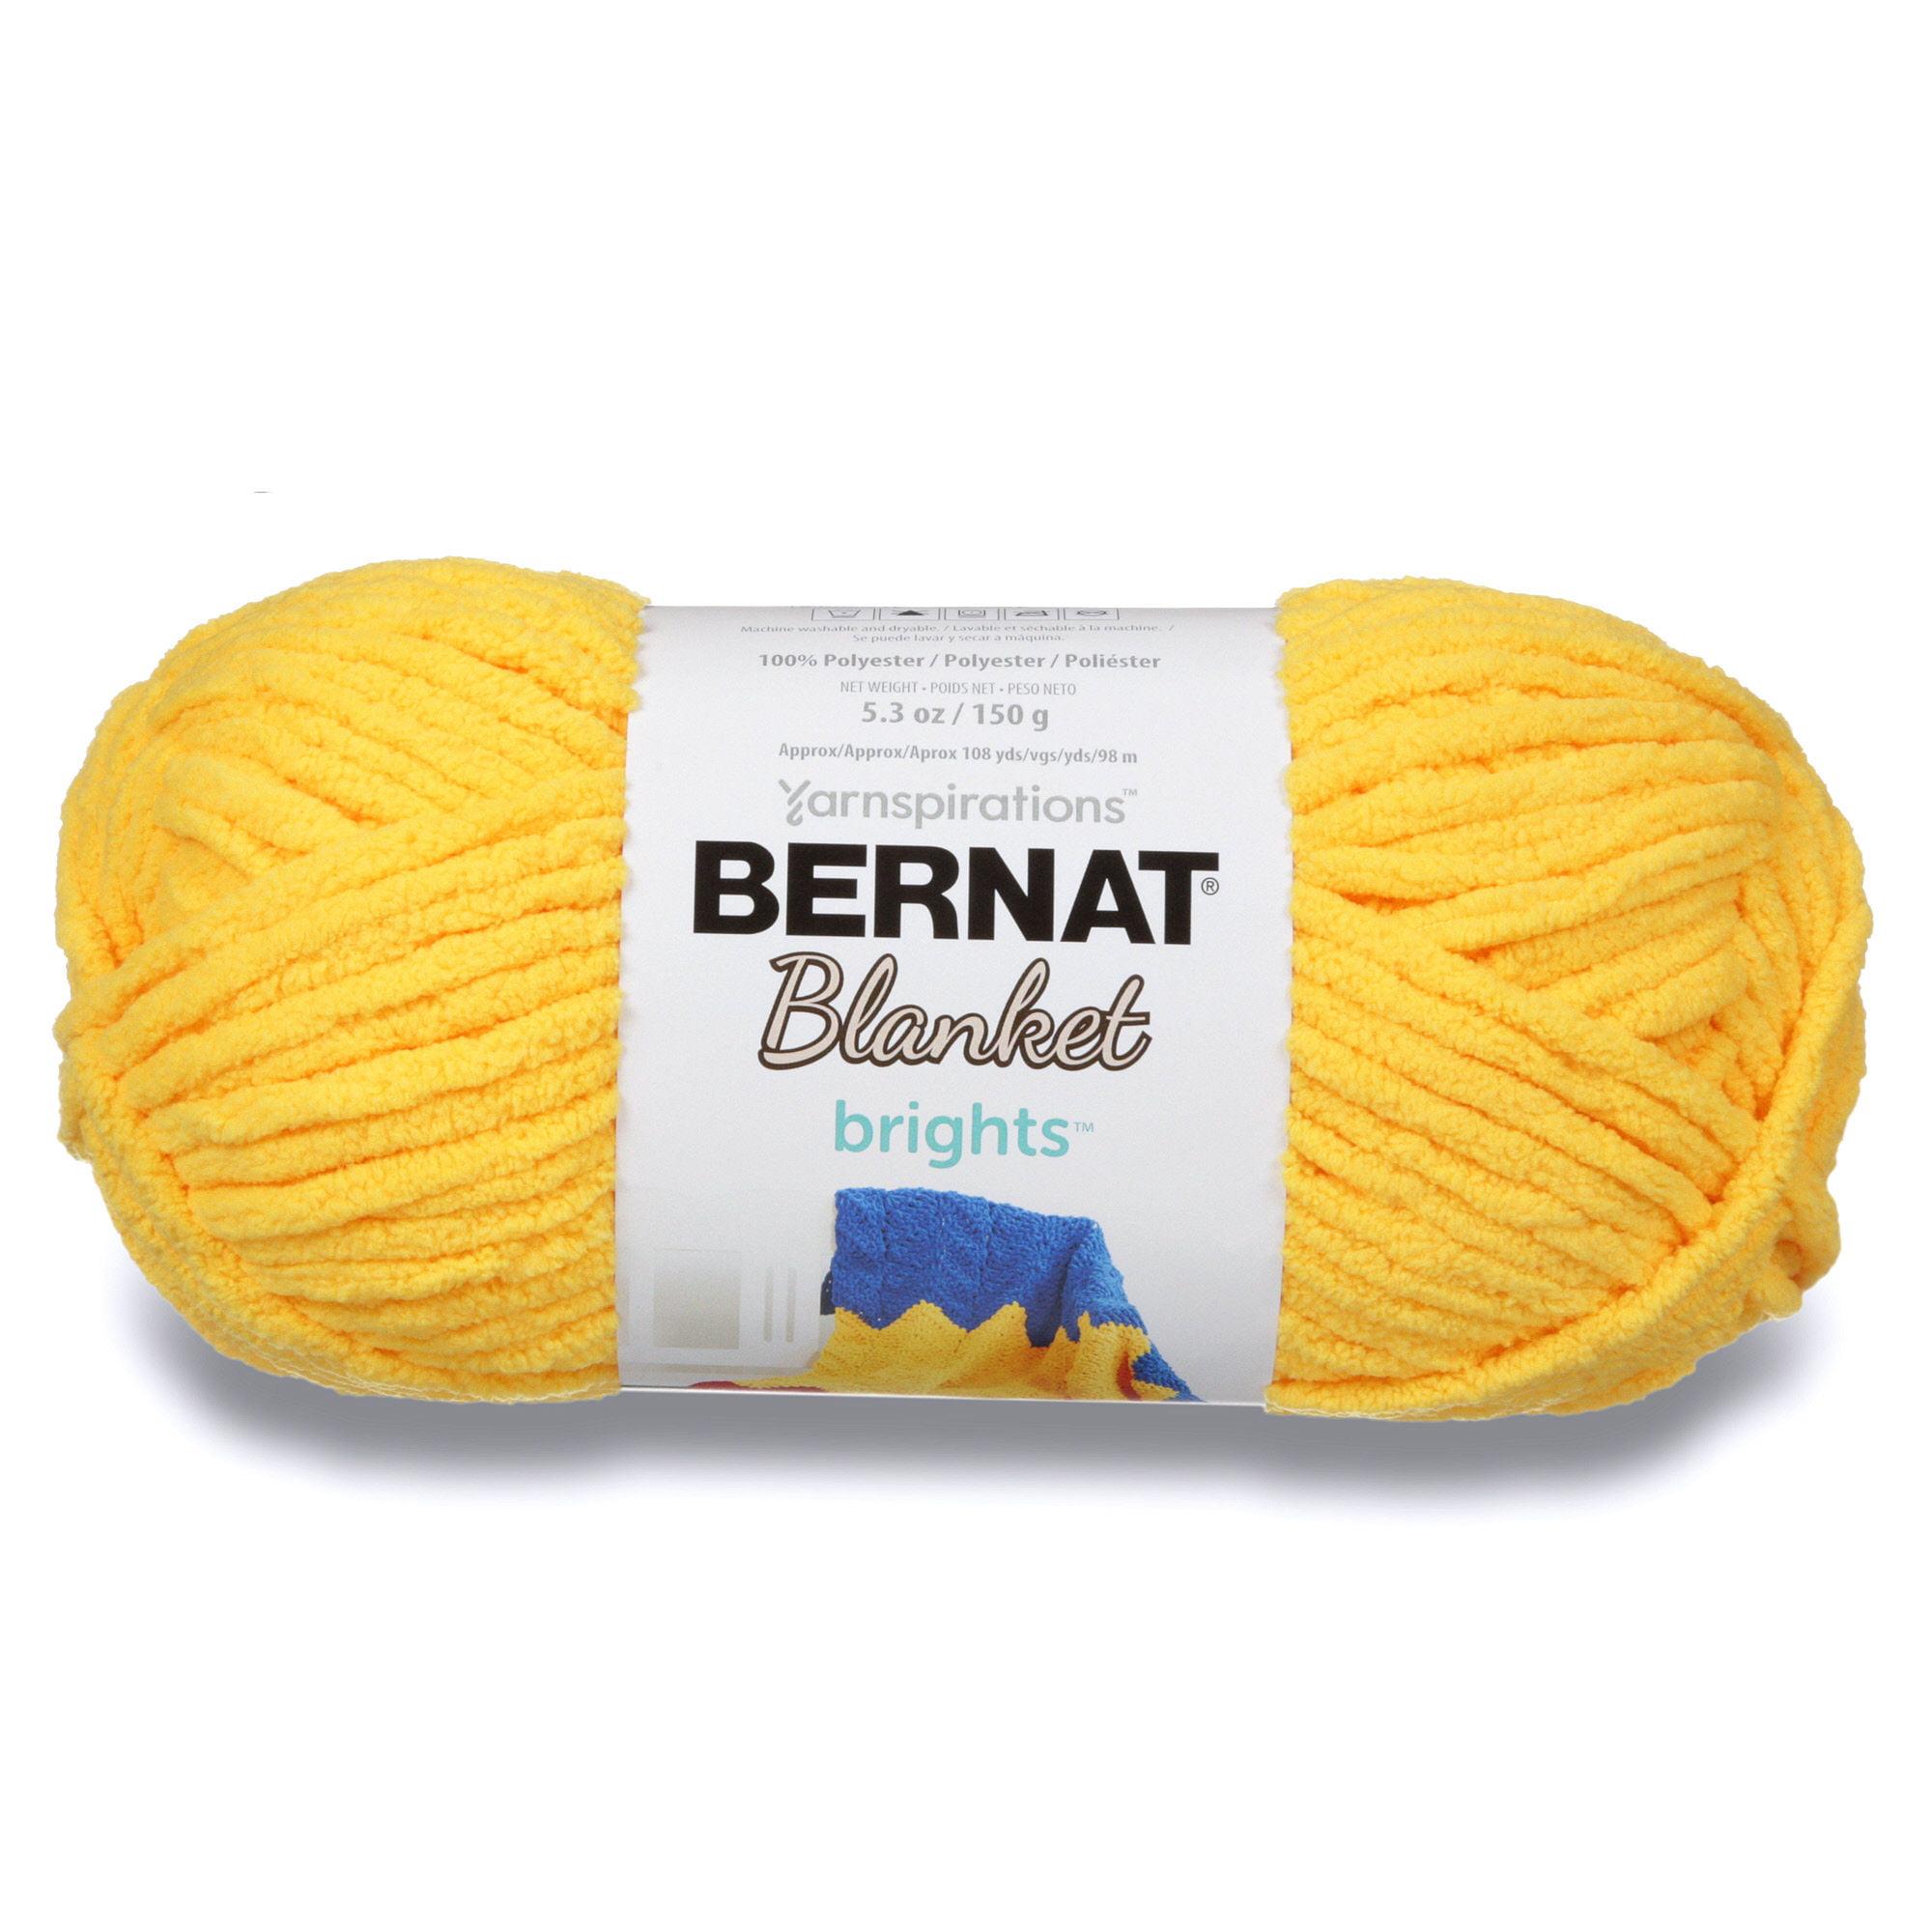 Bernat Polyester Blanket Bright's Yarn, 1 Each